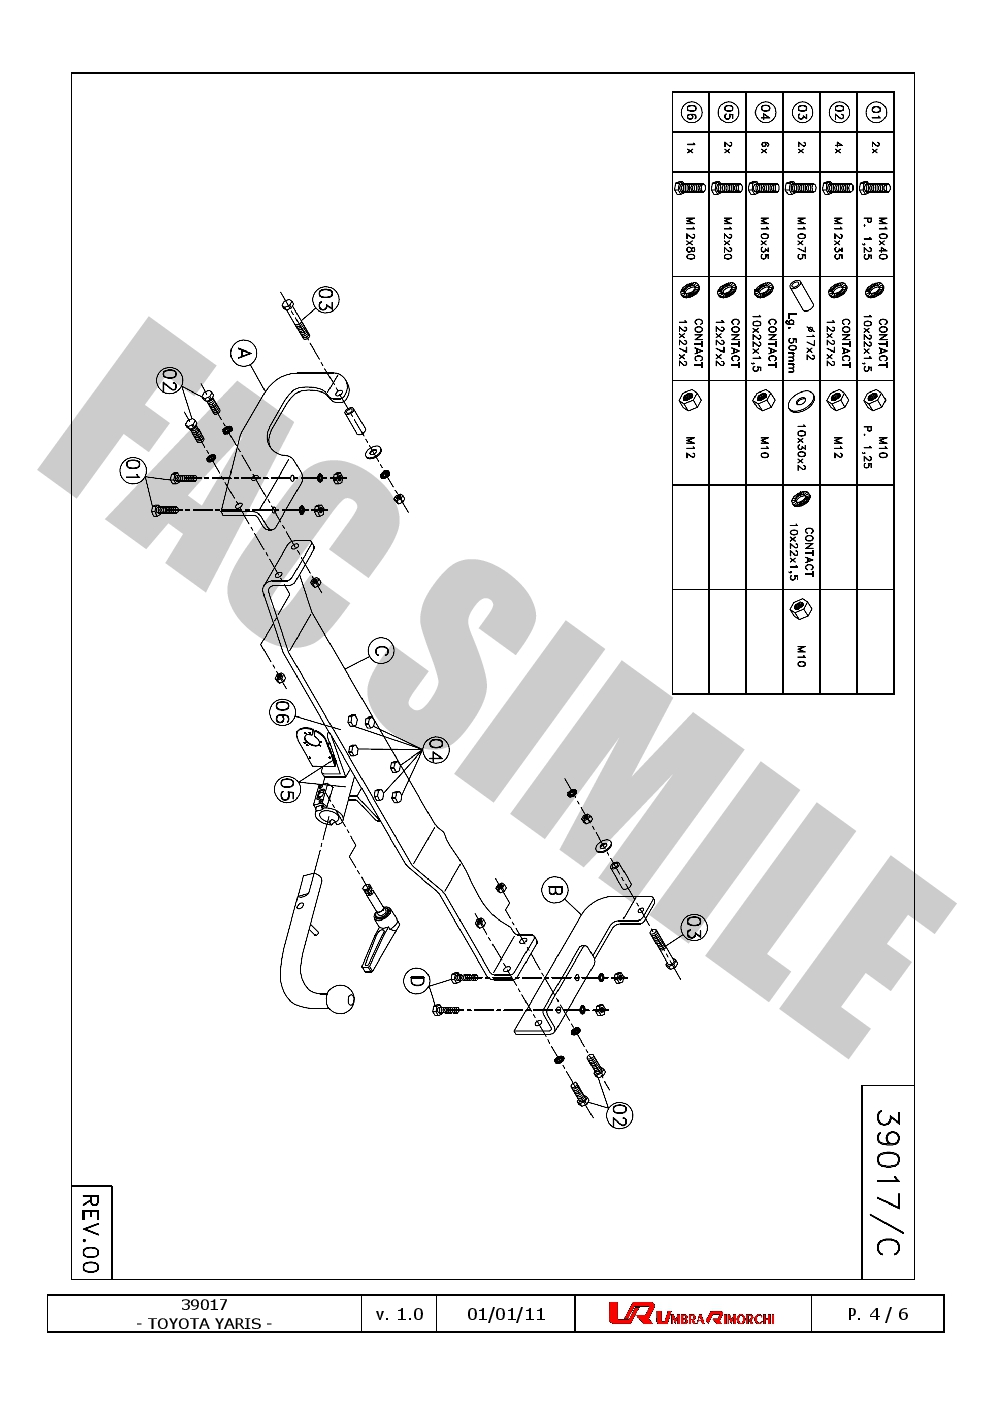 Detachable Towbar For Toyota YARIS Hatchback 3-5door 2001-2005 39017/_H2